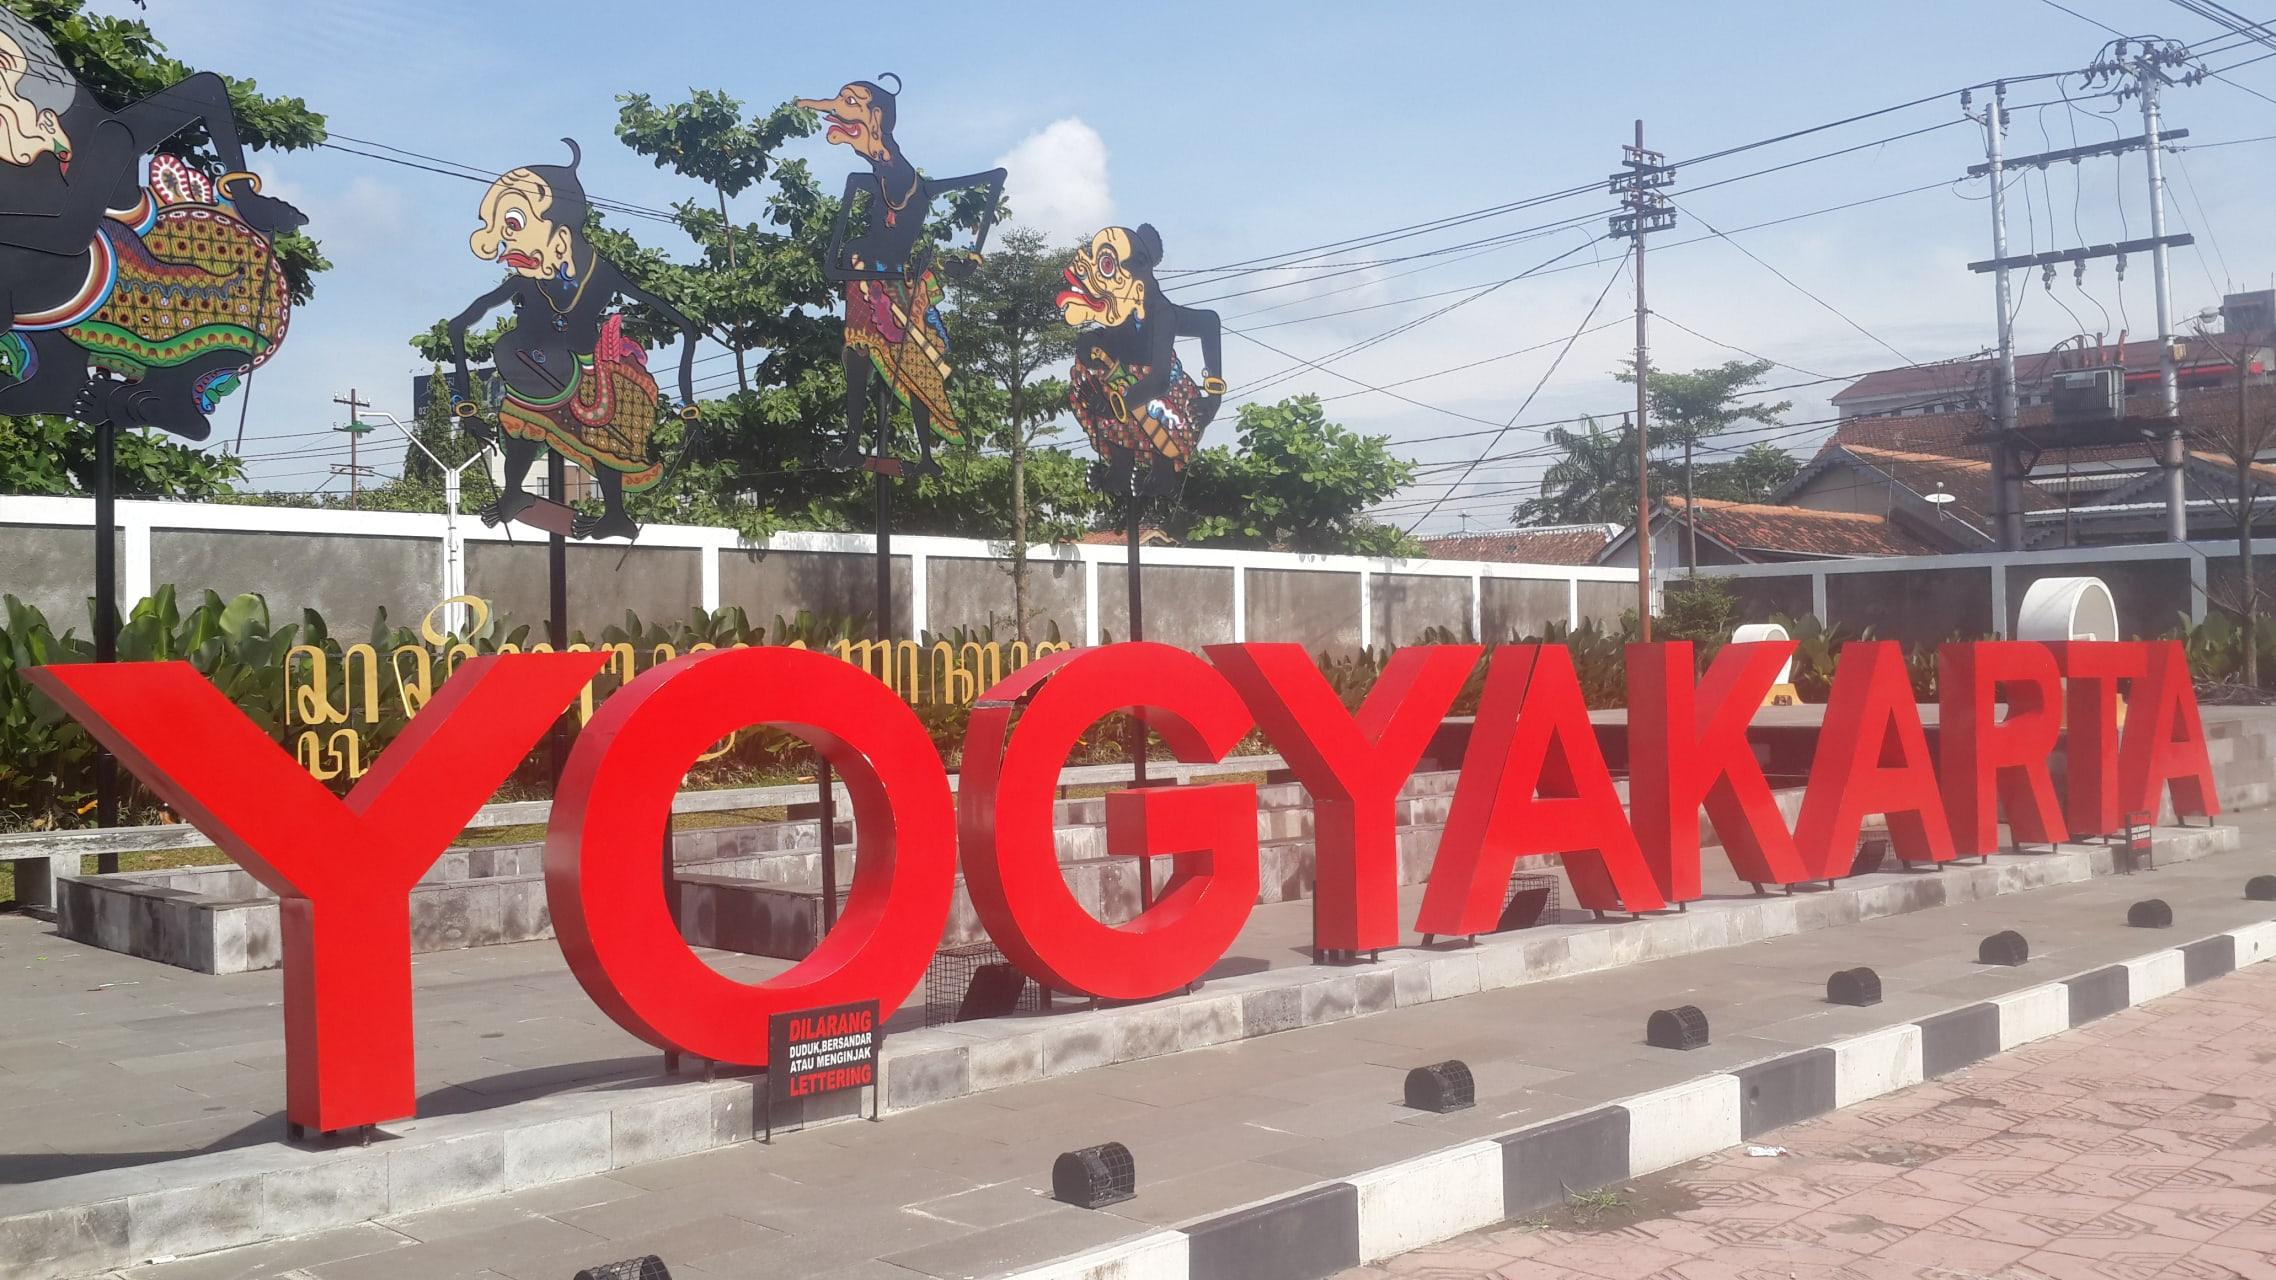 Yogyakarta - Malioboro: Central Market, Colonial Buildings, and Street Foods